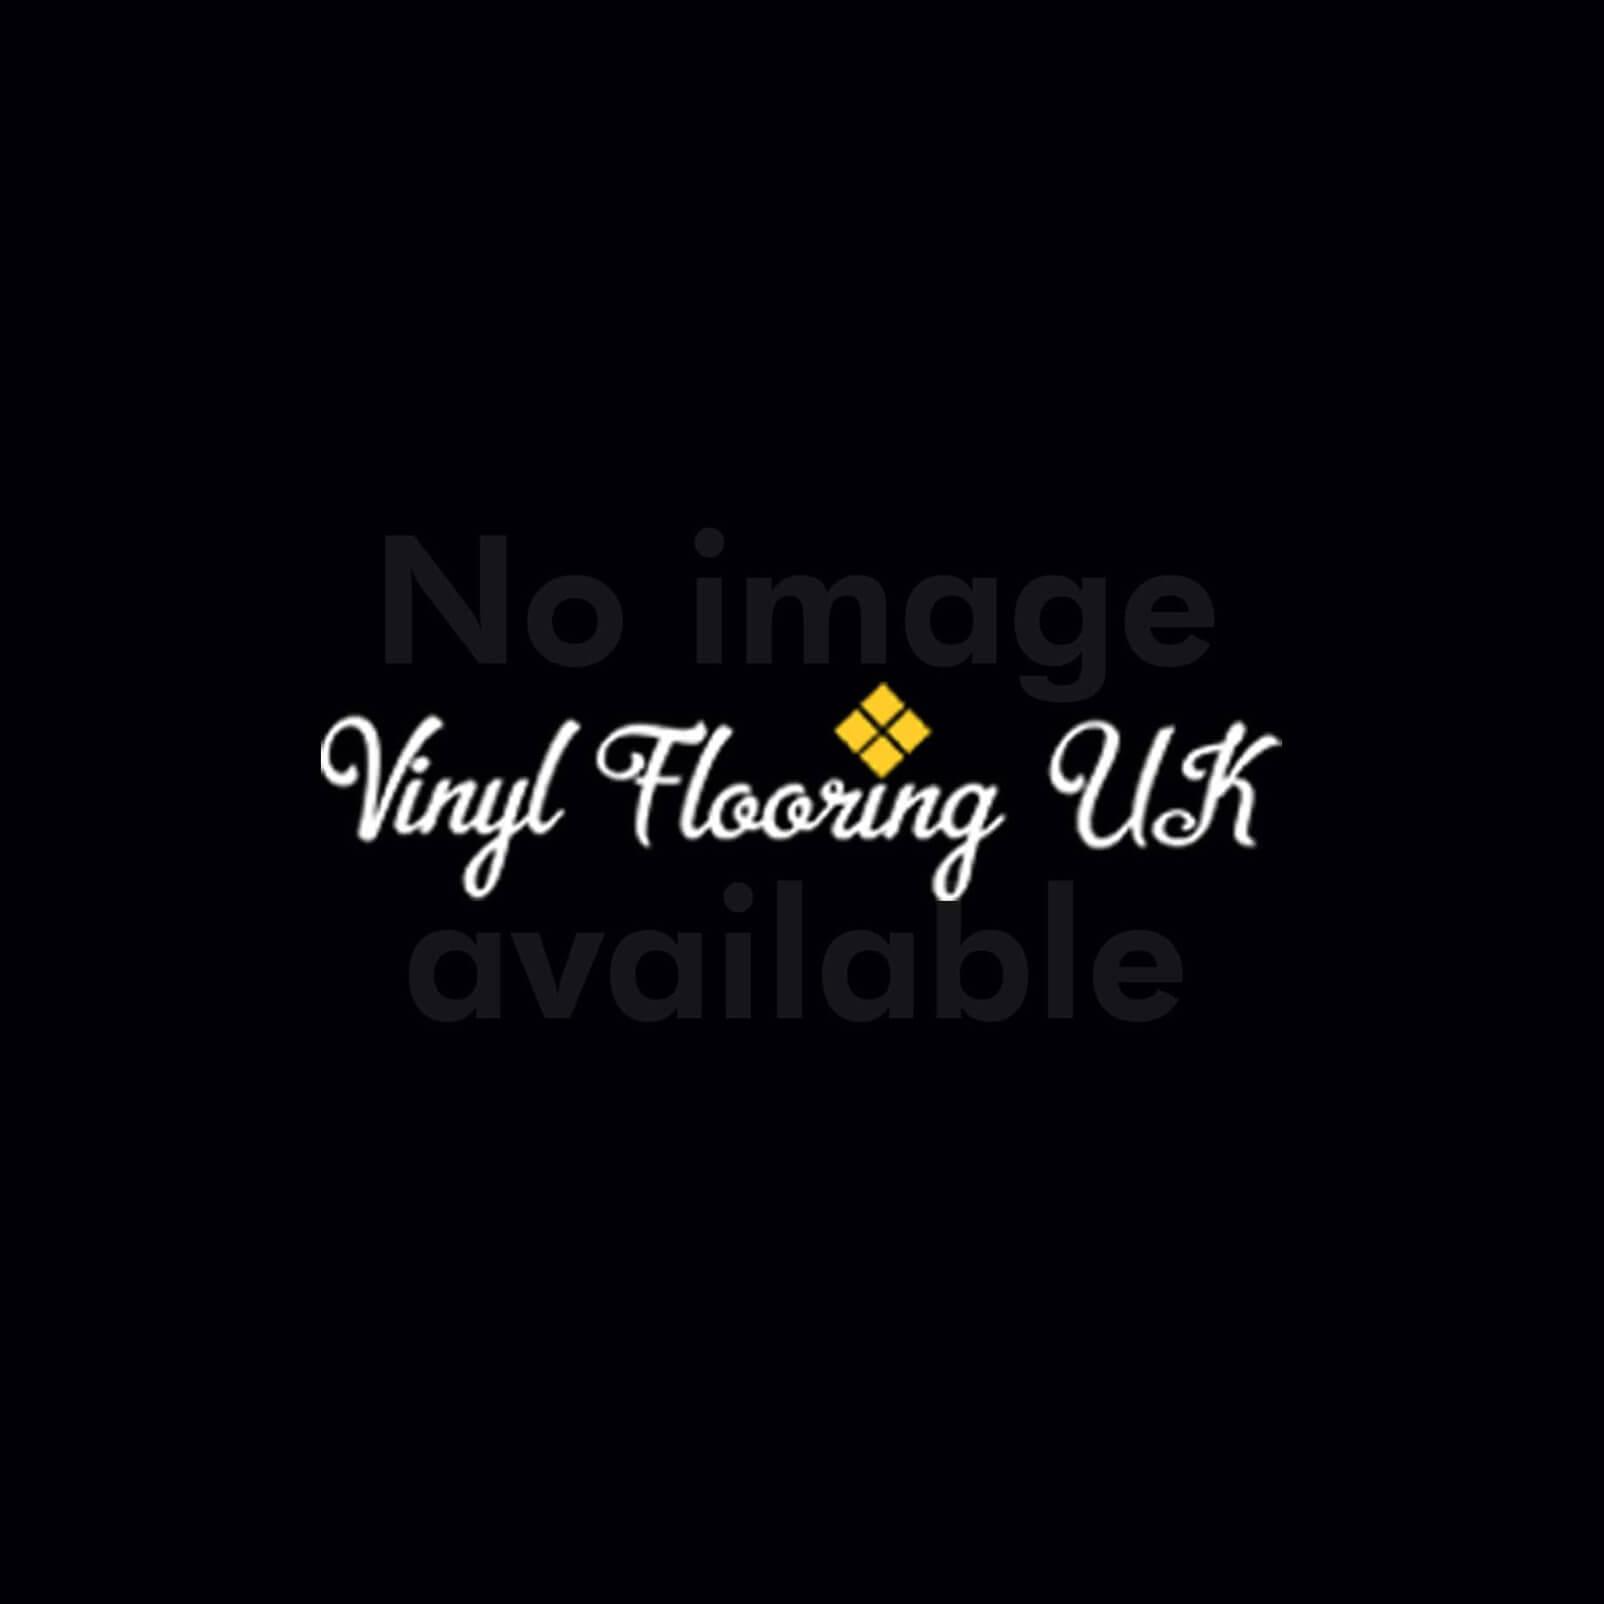 Sample of Lifestyle BaroqueCheckerboard Vinyl Flooring